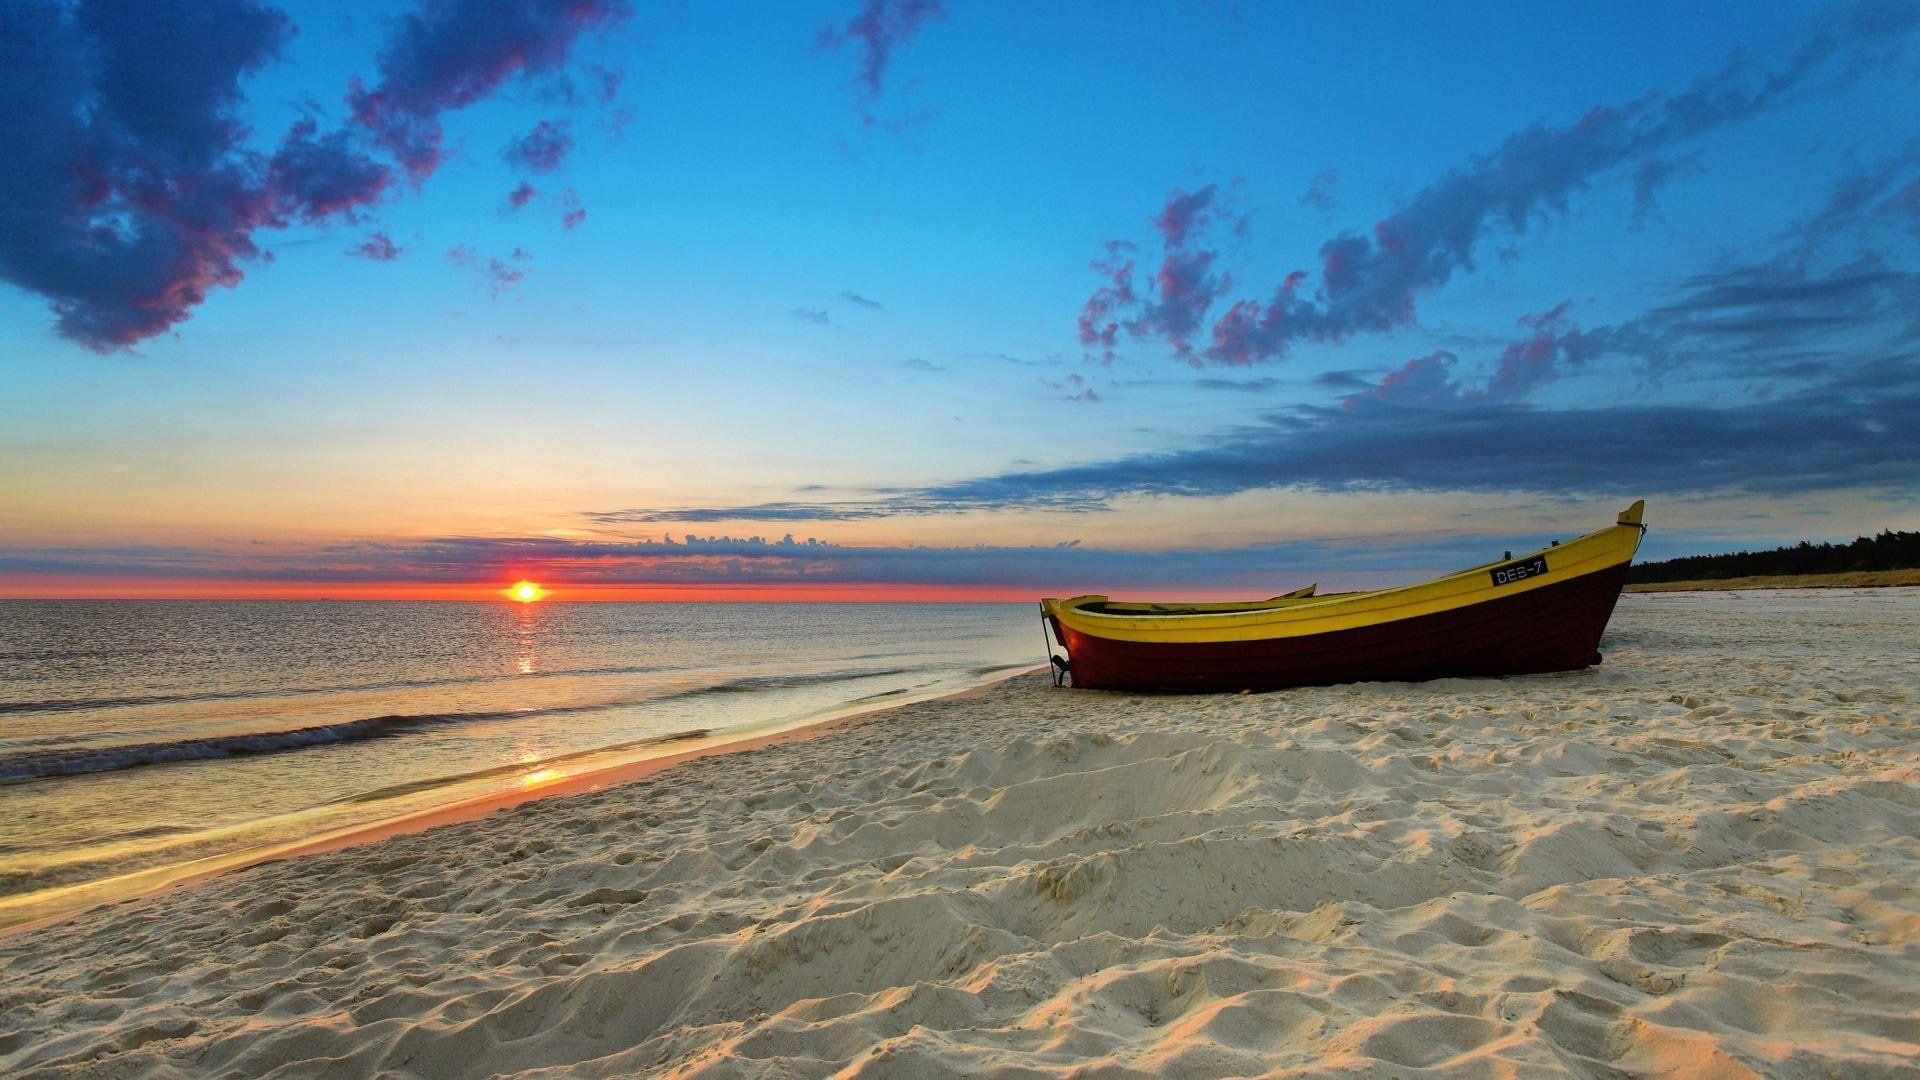 Nature Sunset Sea Beach Boat 1080p Wallpaper Hdwallpaper Desktop Beach Wallpaper Beach Background Beach Sunset Wallpaper